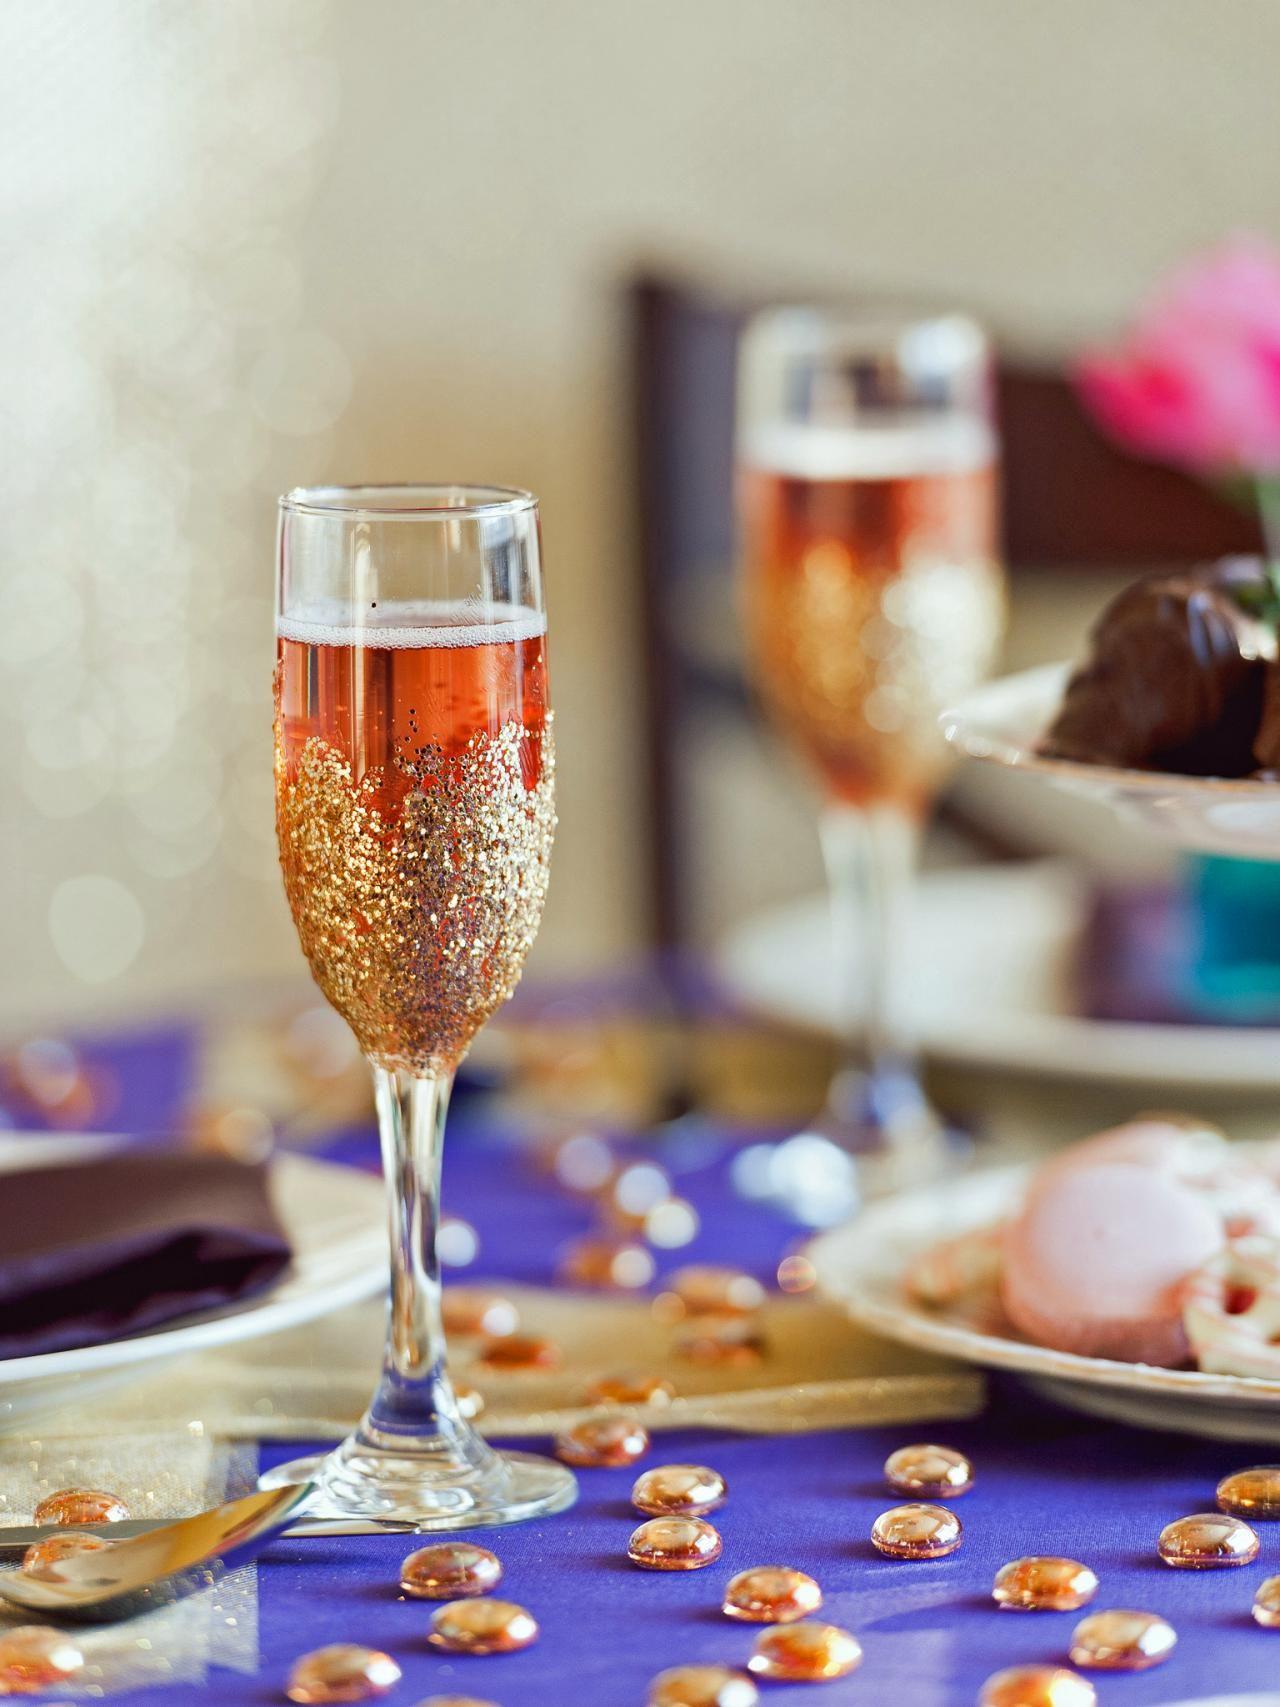 How to Make Glitter Champagne Flutes Champagne flutes